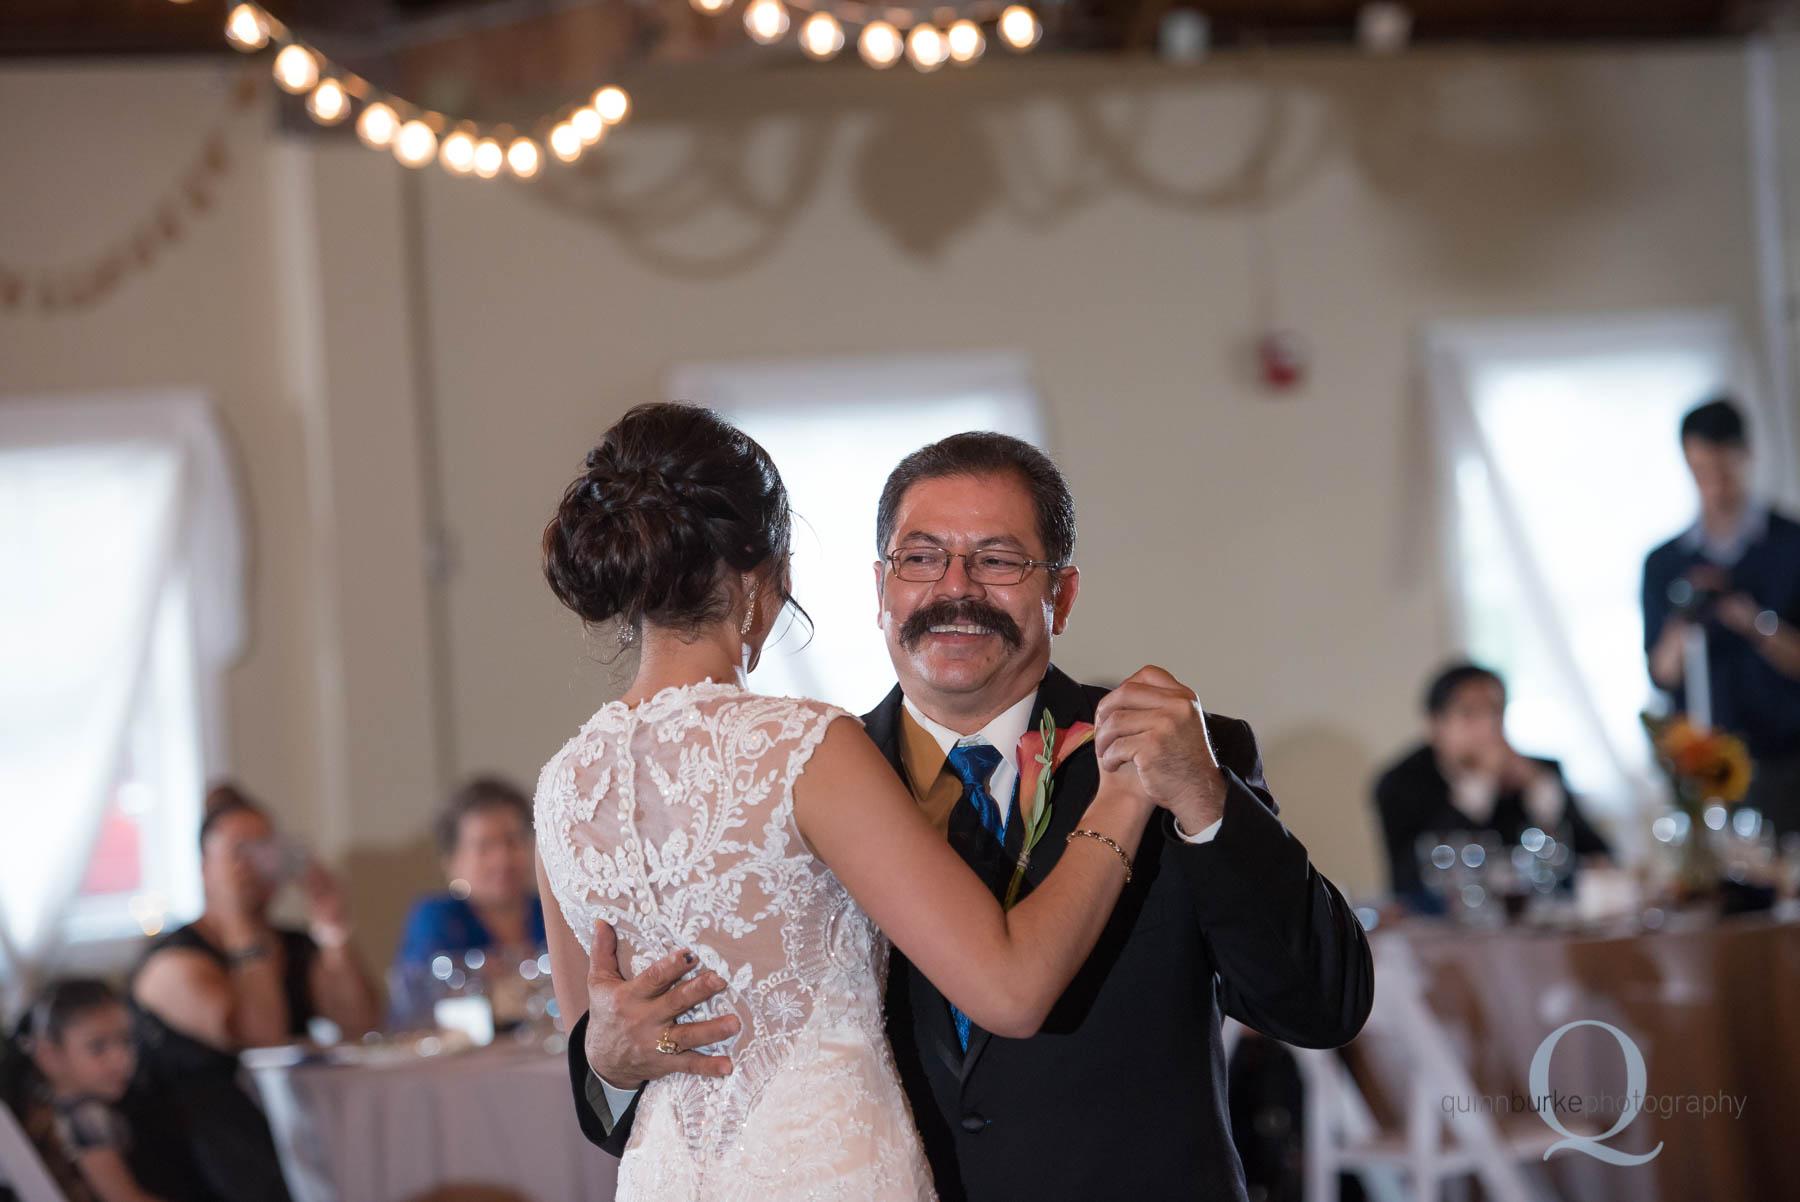 dad dancing with bride daughter during reception at Green Villa Barn